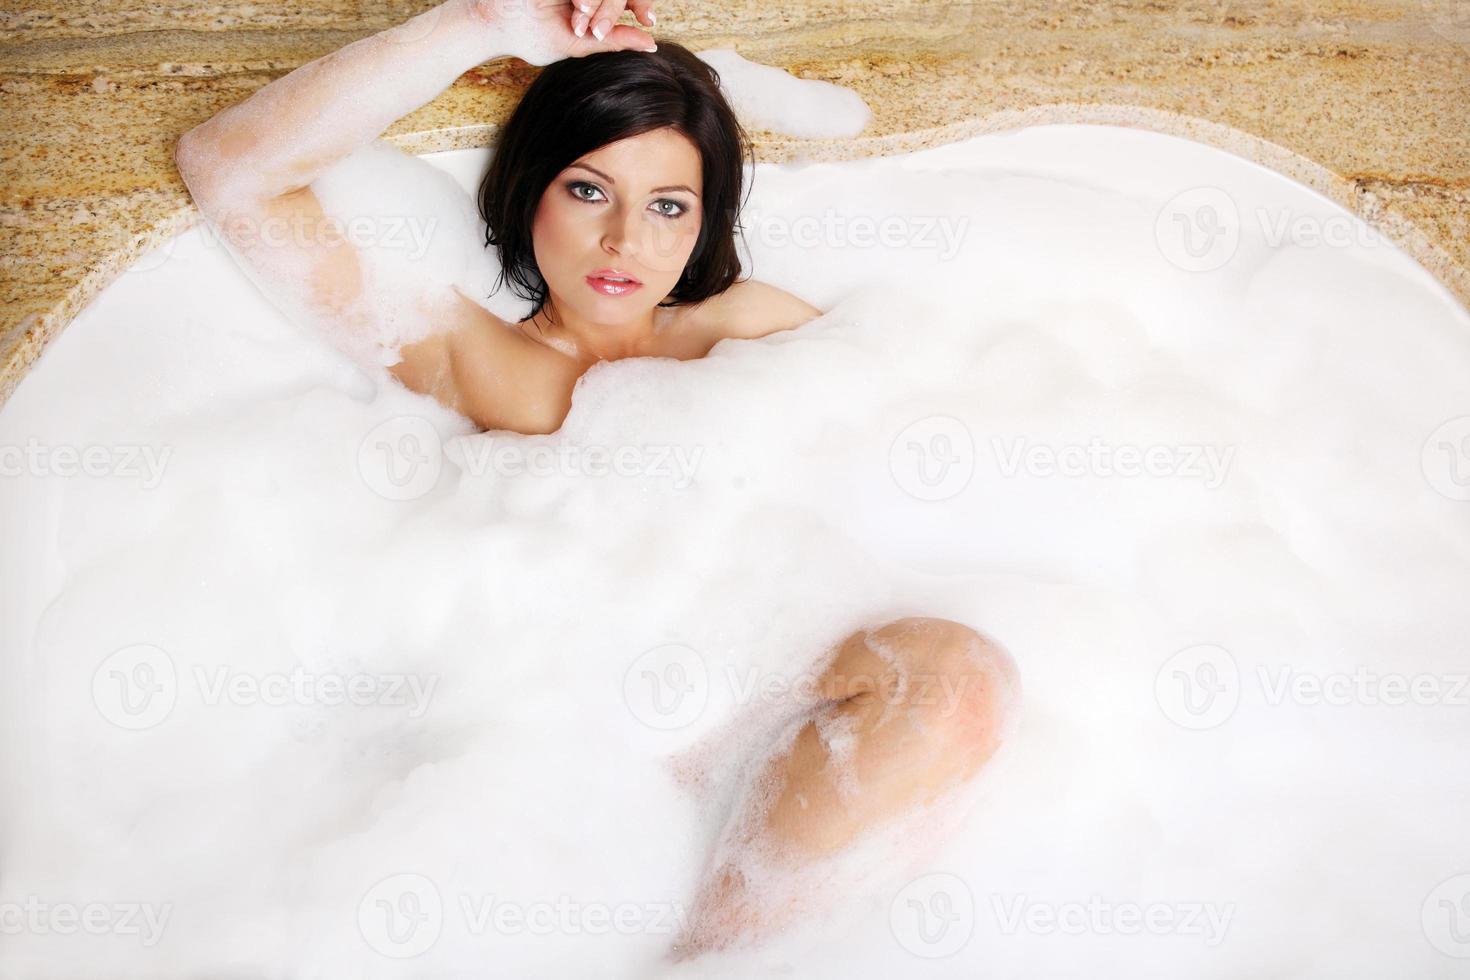 bubbelbad foto